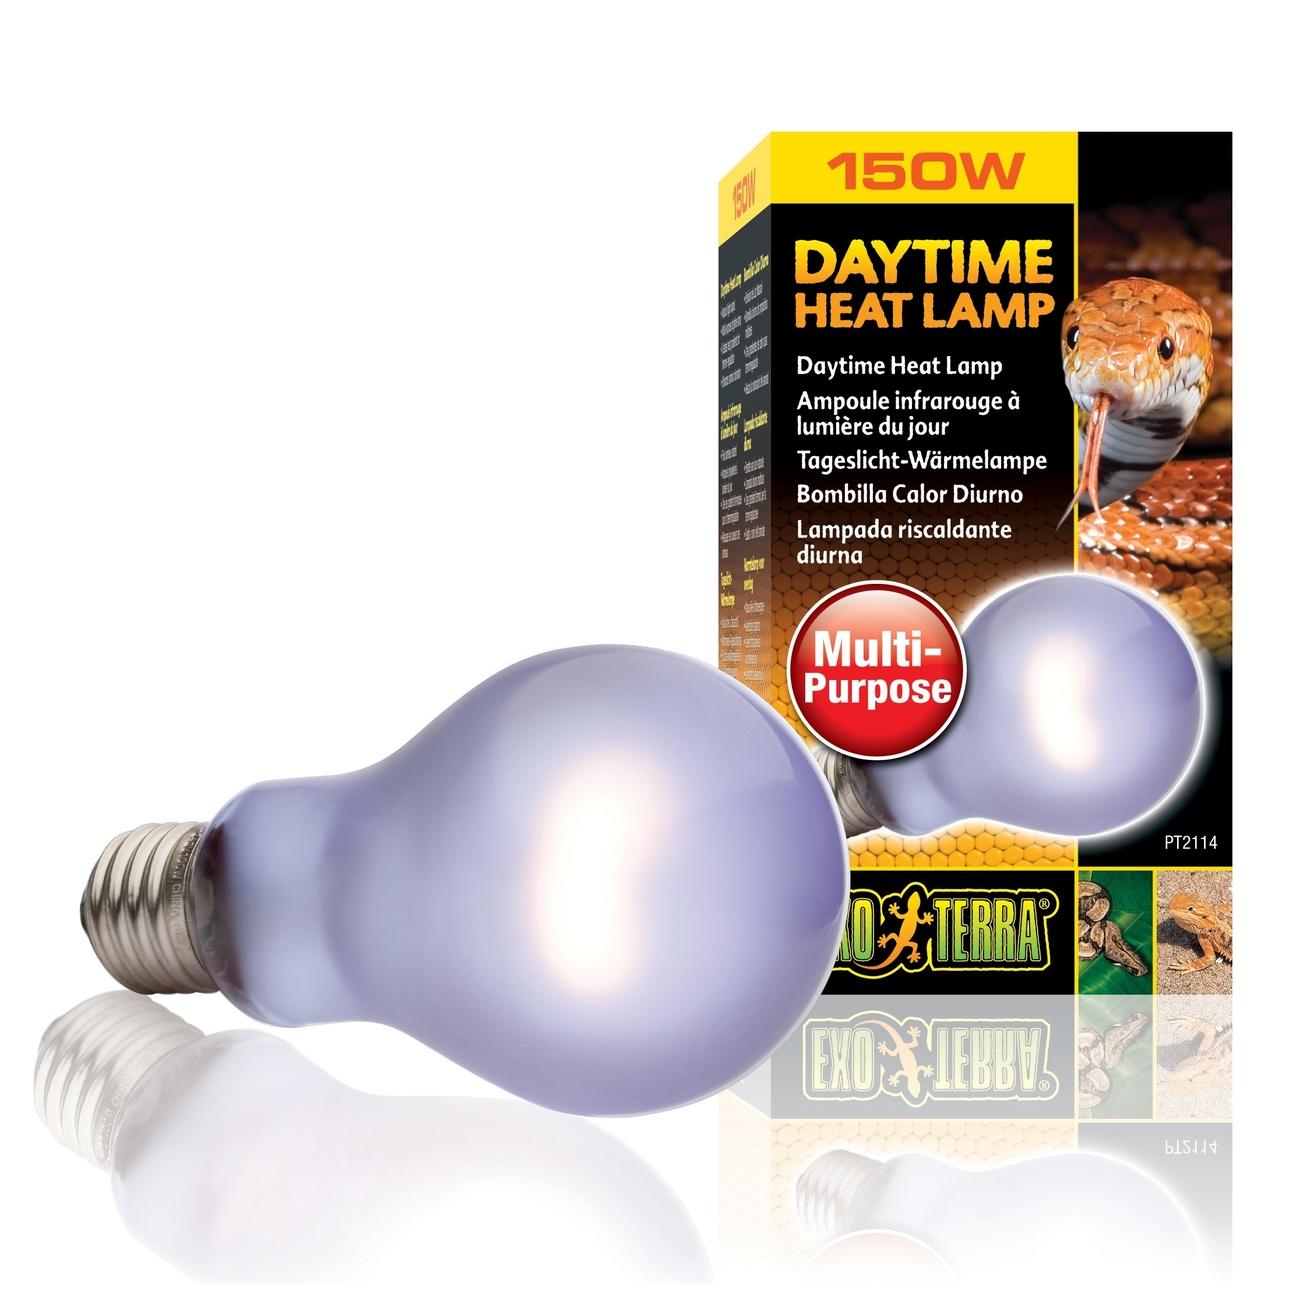 Exo Terra - Daytime Heat Lampe Bild 13